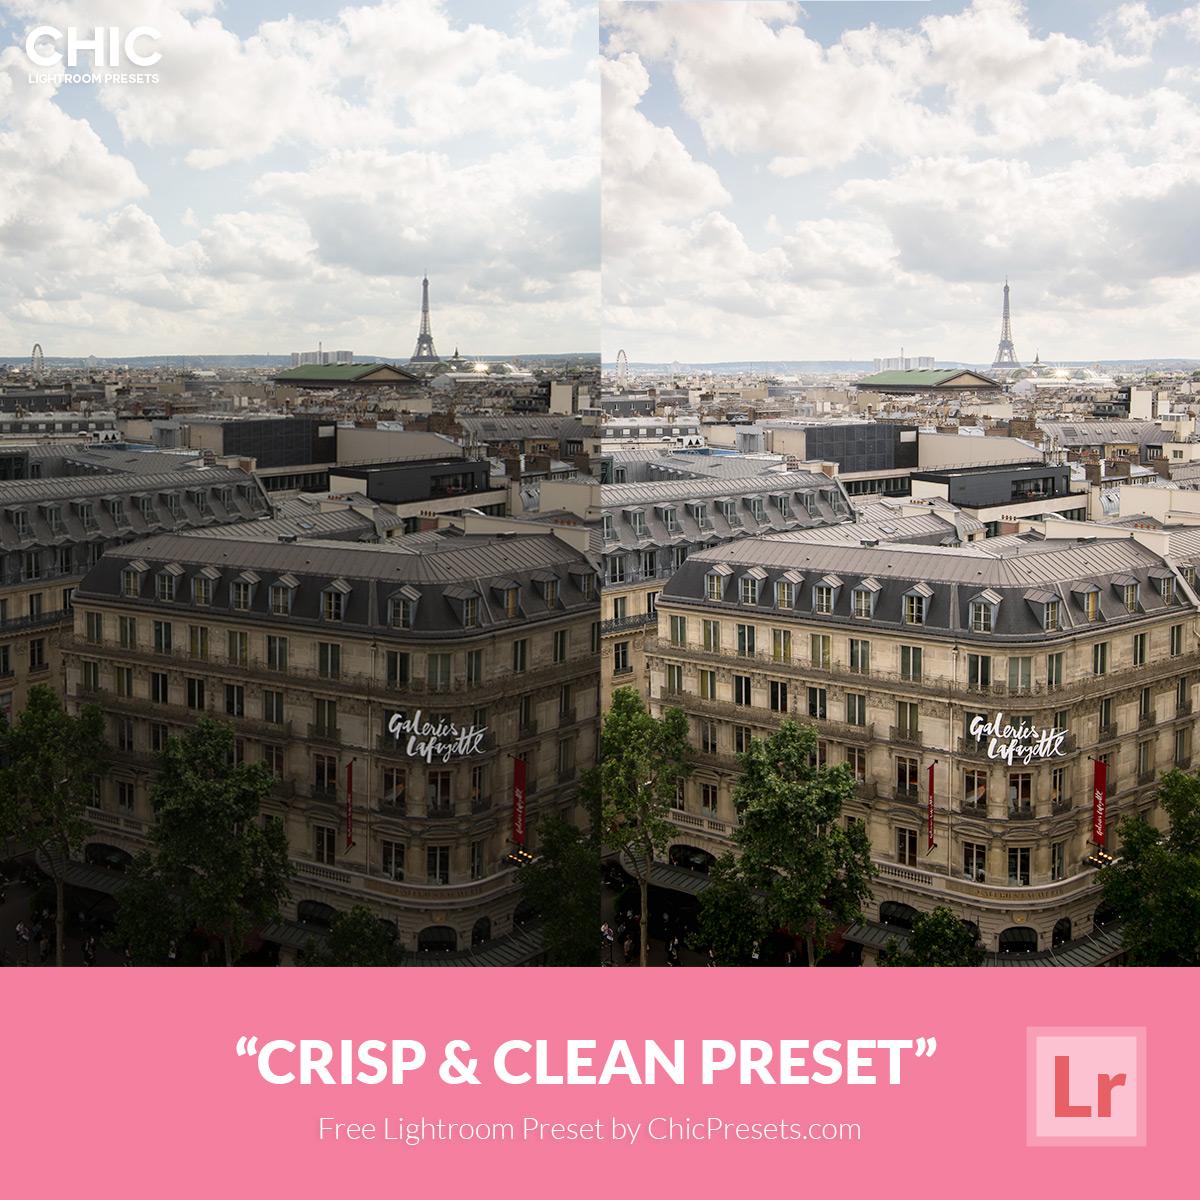 Crisp-&-Clean-Preset-Chic-Lightroom-Presets